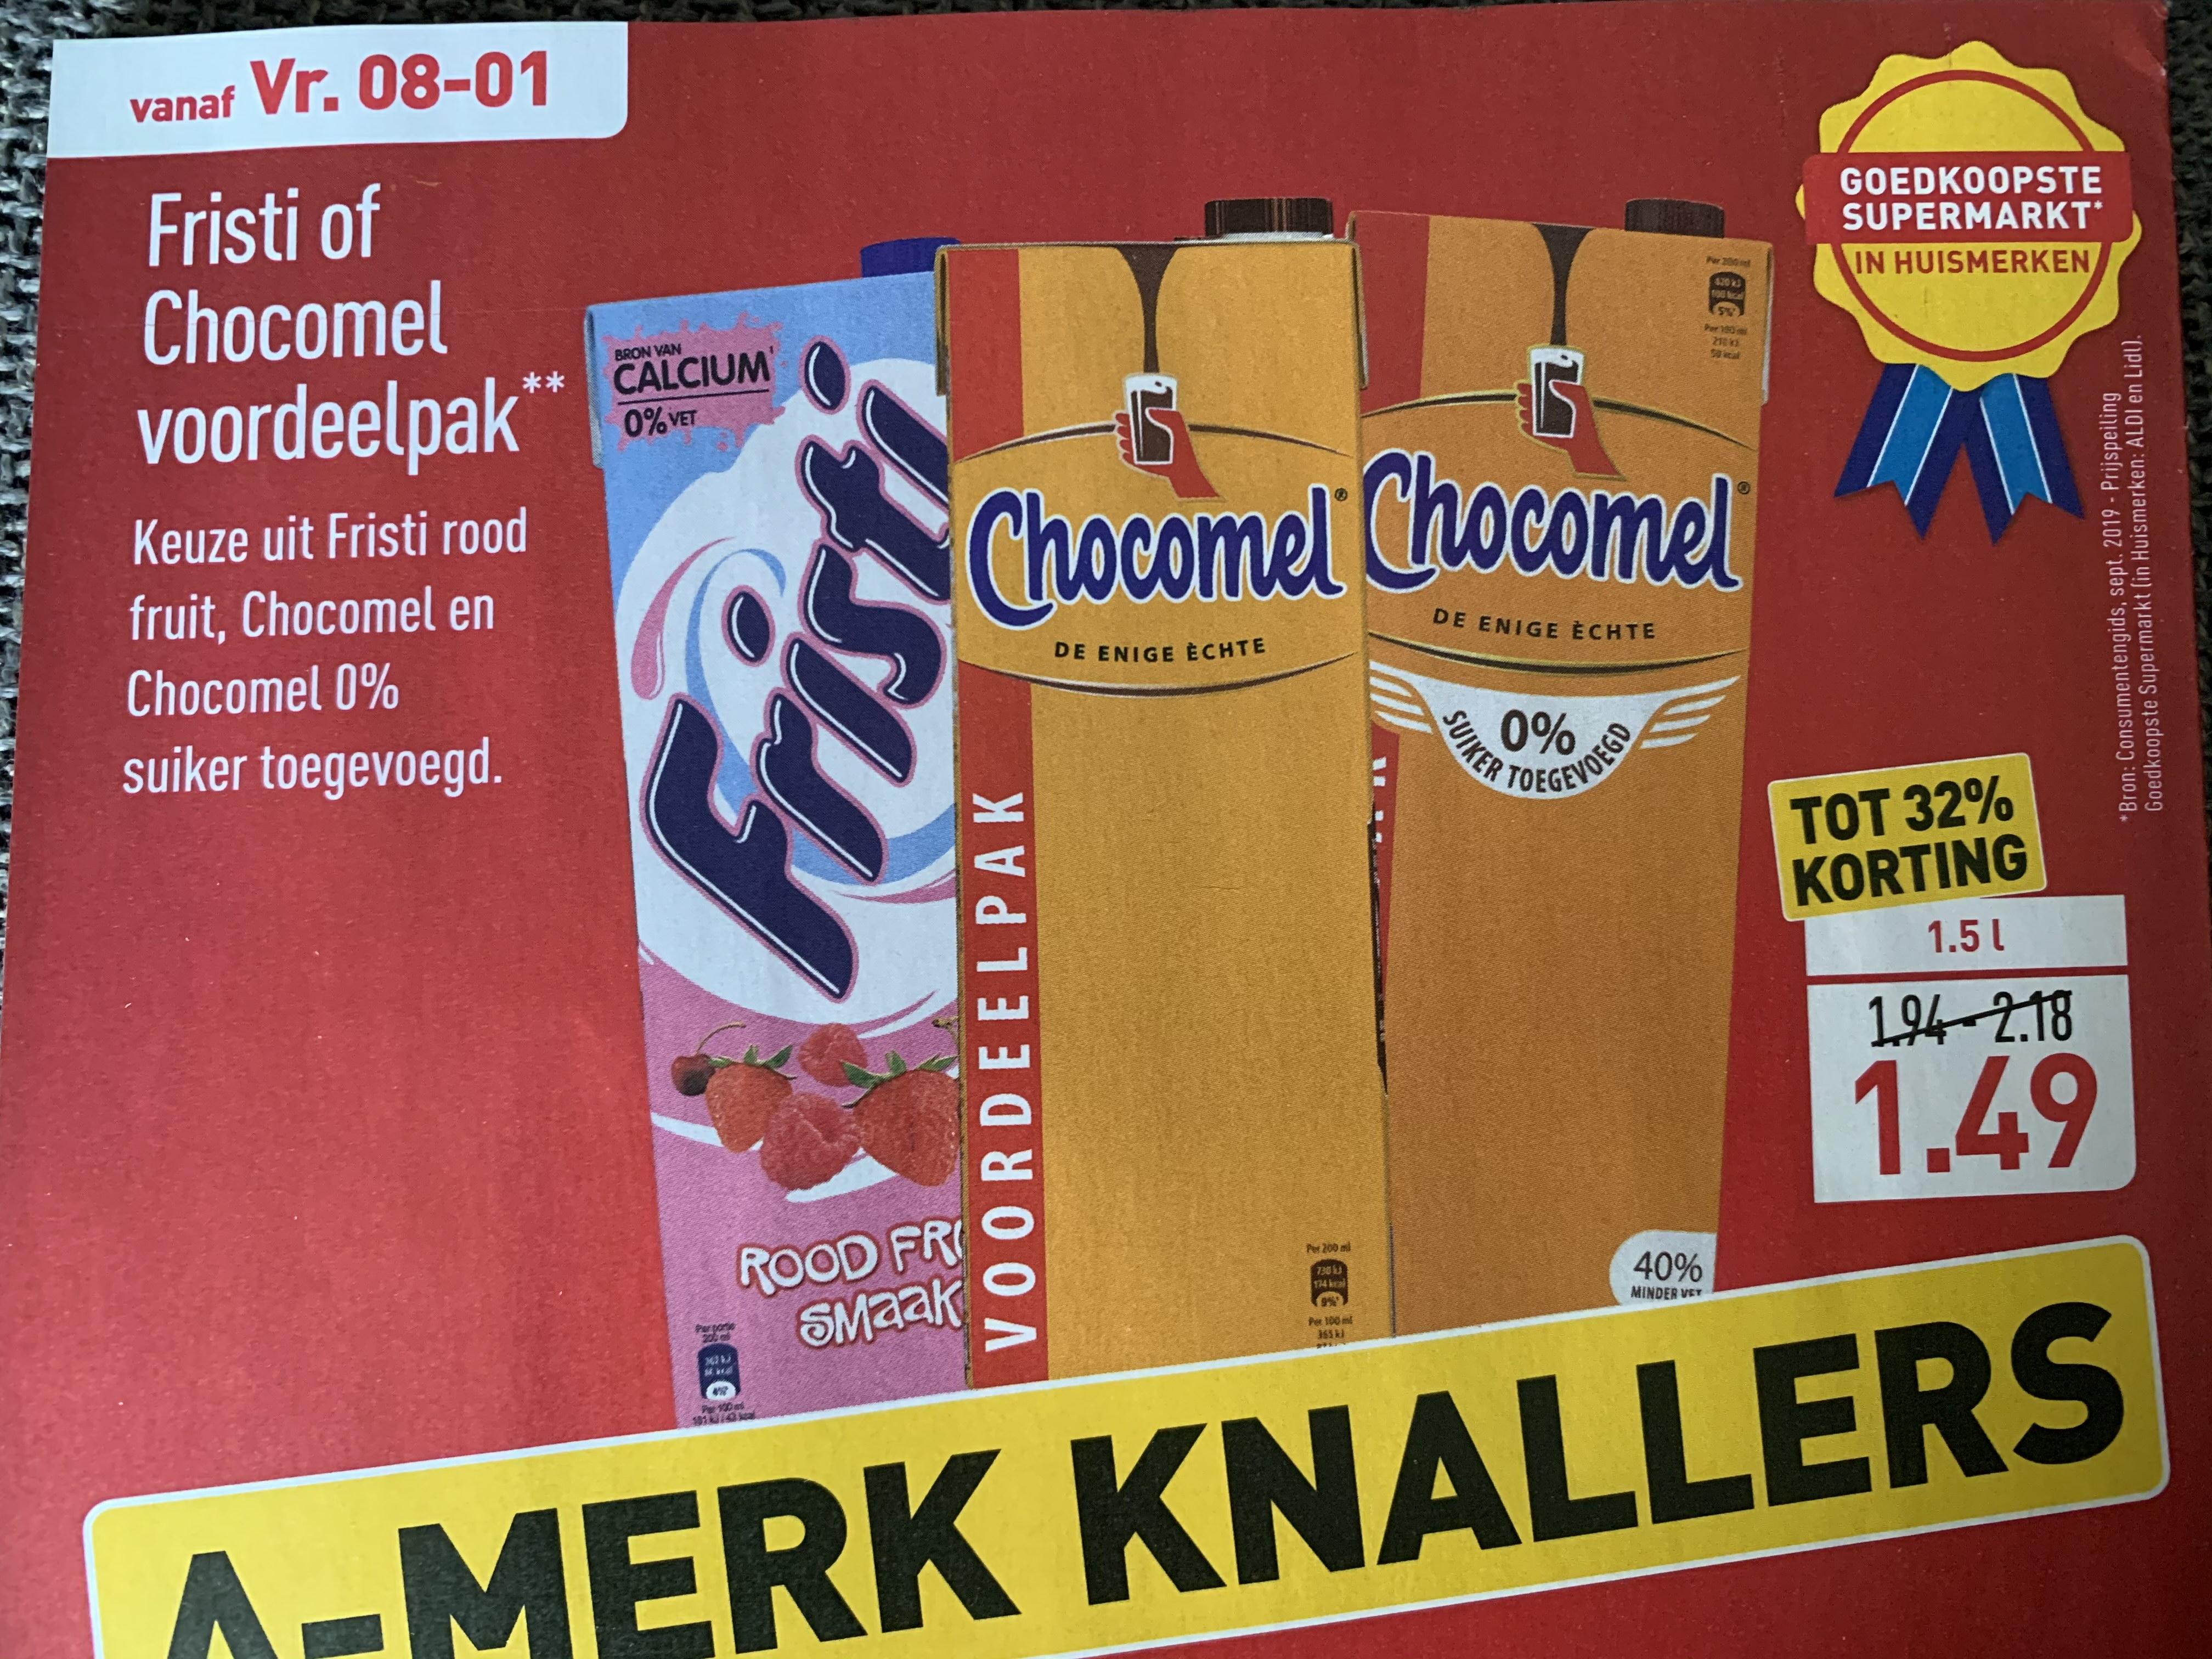 Aldi 1.5L Fristi of Chocomel (vanaf 8-1)